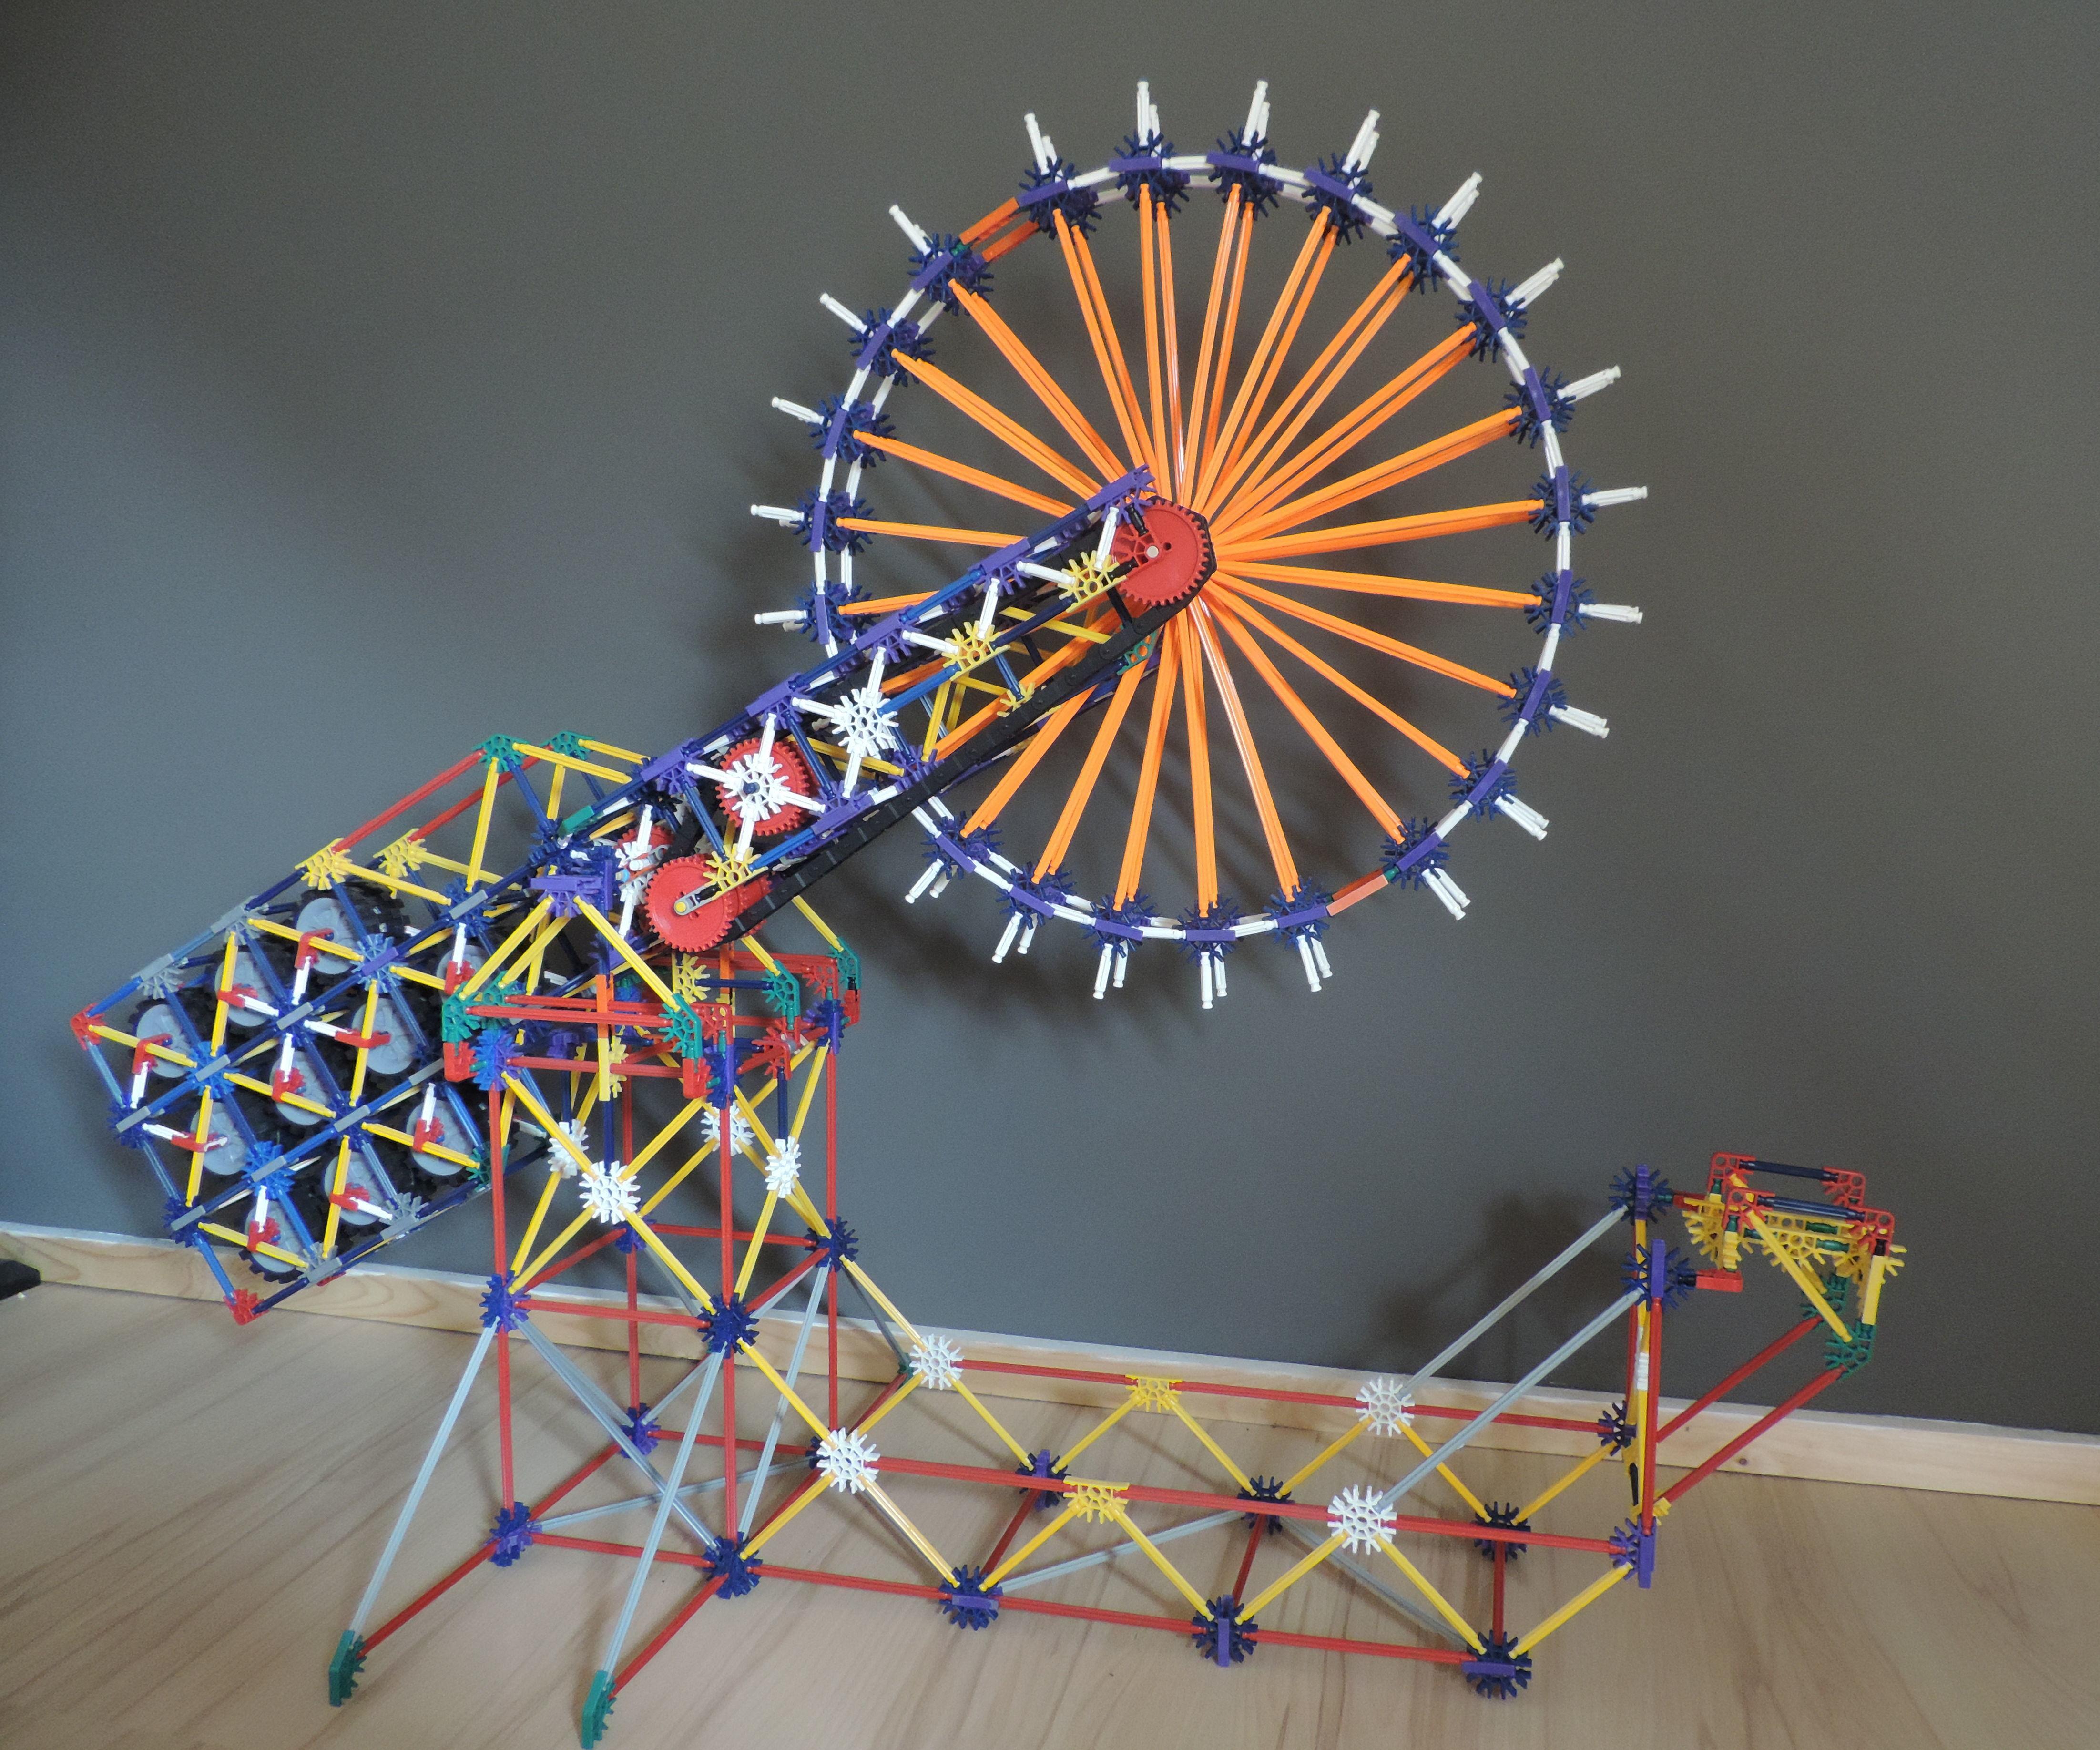 Knex Ball Machine Elelement: BuzzSaw